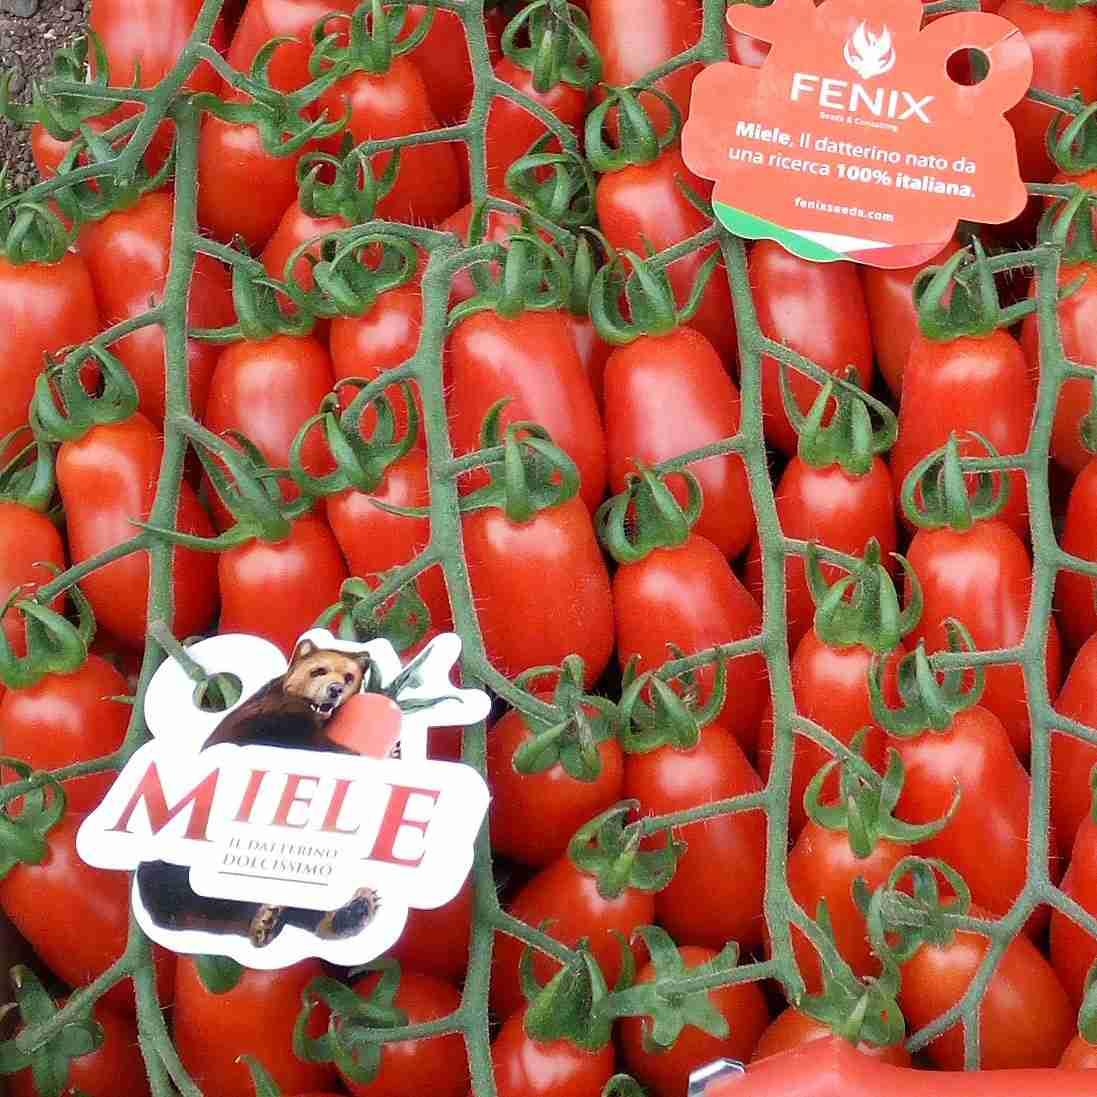 Pomodoro categoria datterino FENIX